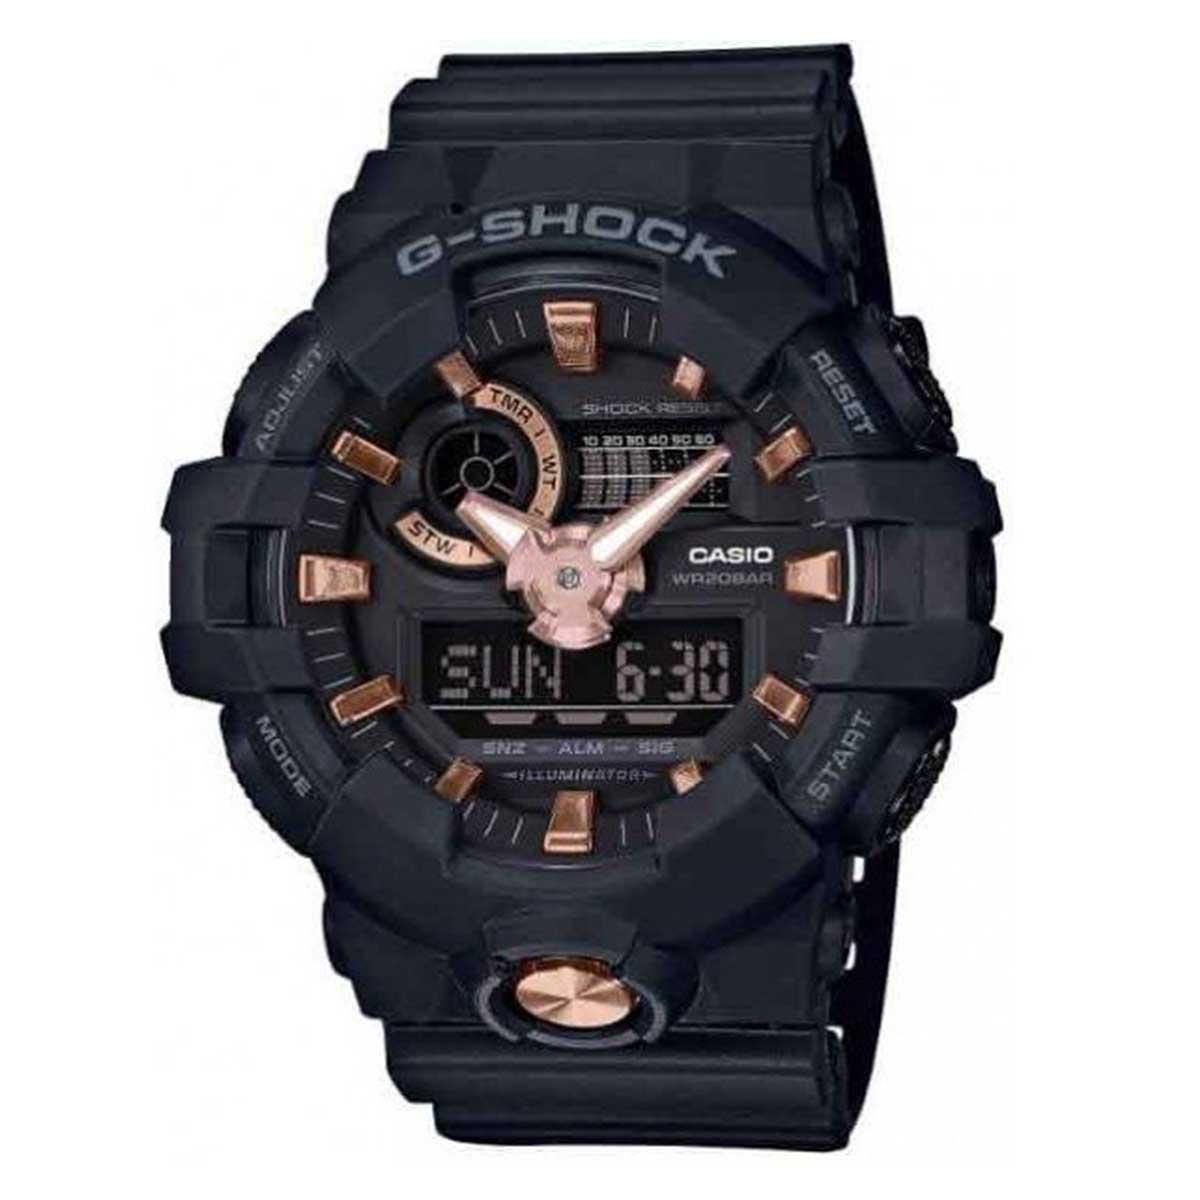 Relógio de Pulso Casio G-ShocK GA-710B-1A4DR